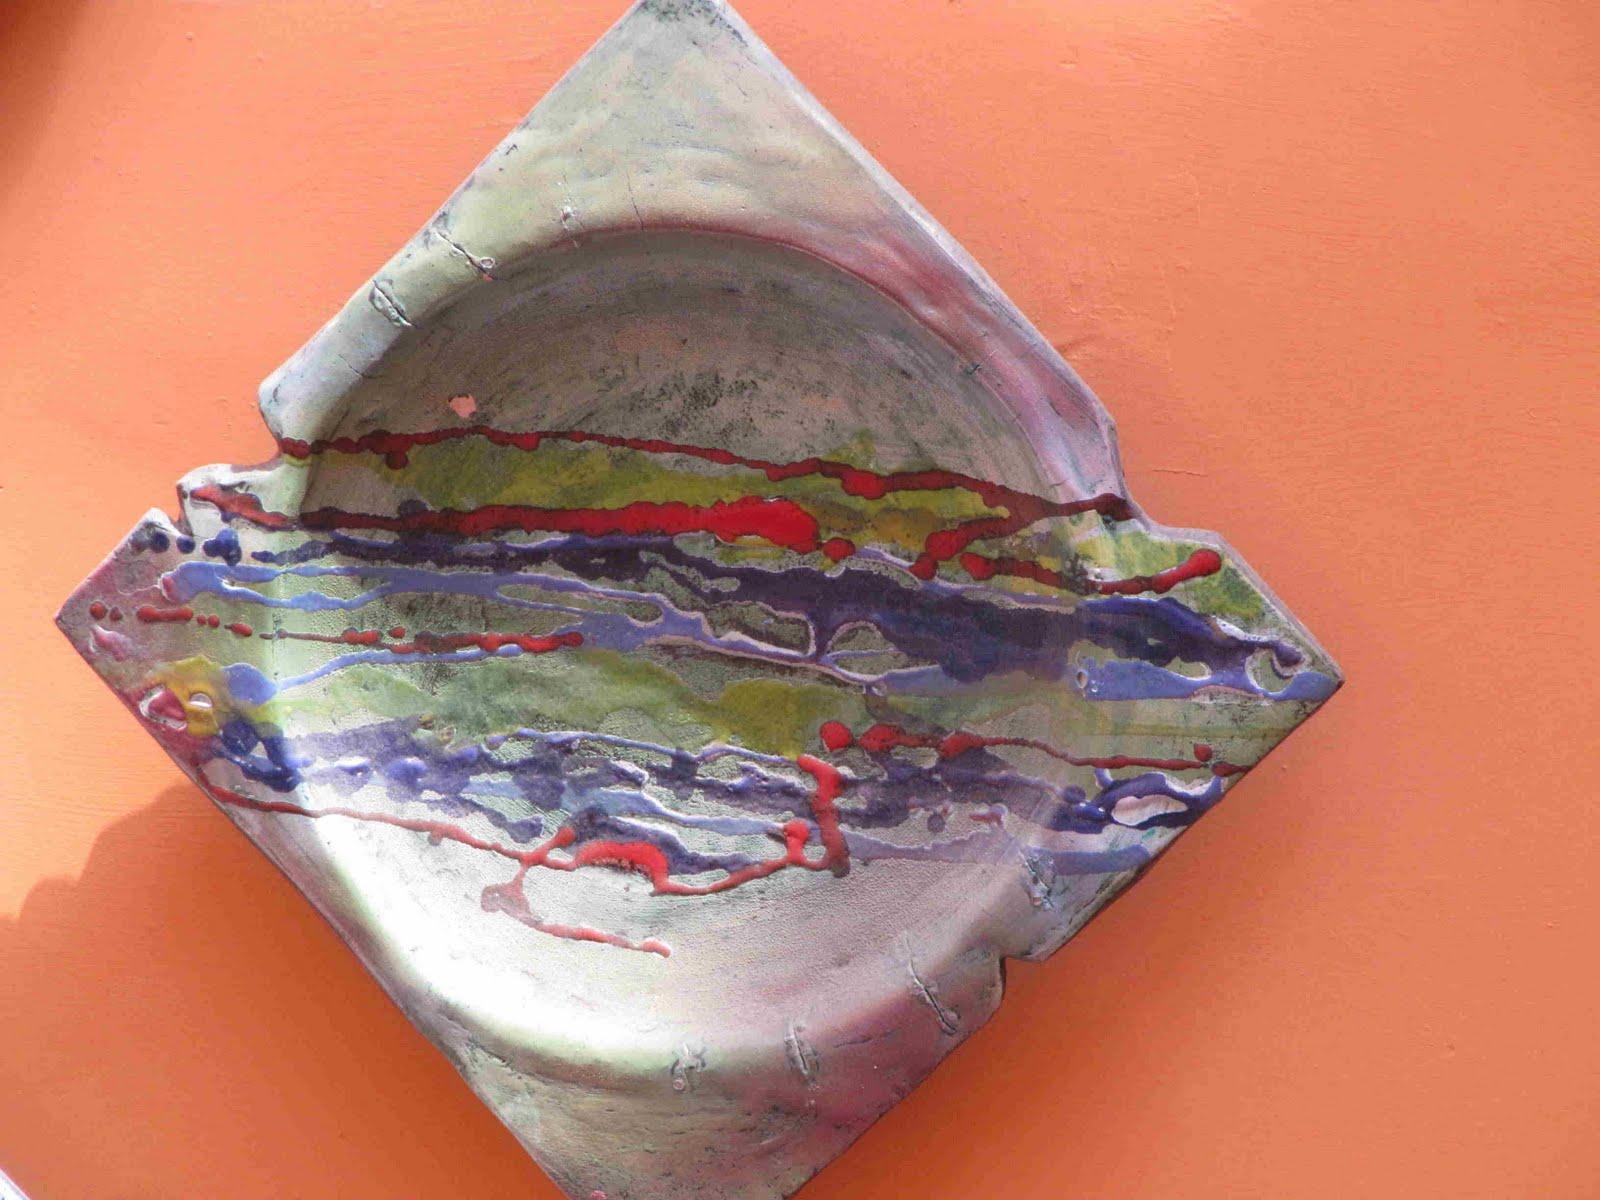 http://2.bp.blogspot.com/-5vmyR_D_dZg/Tf6ukGAKYwI/AAAAAAAAAYc/BF3Z8PQ-T6g/s1600/havana+pottery+low.JPG